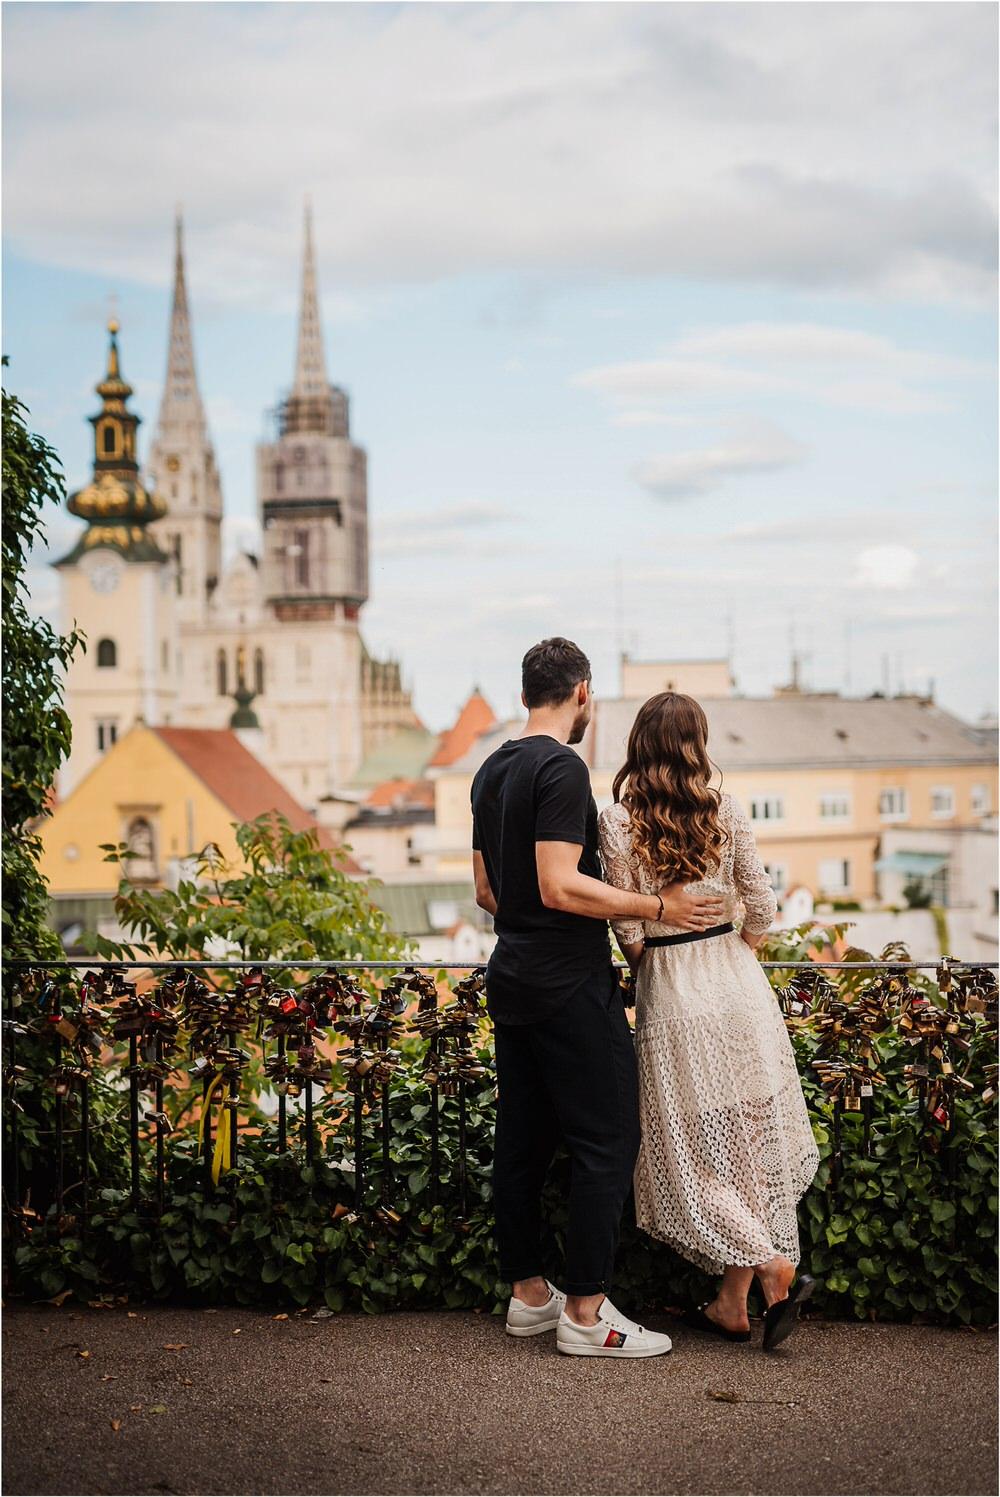 zagreb wedding poroka vjencanje vencanje fotograf photographer foto croatia hrvatska hrvaska zaroka engagement relaxed natural 0004.jpg